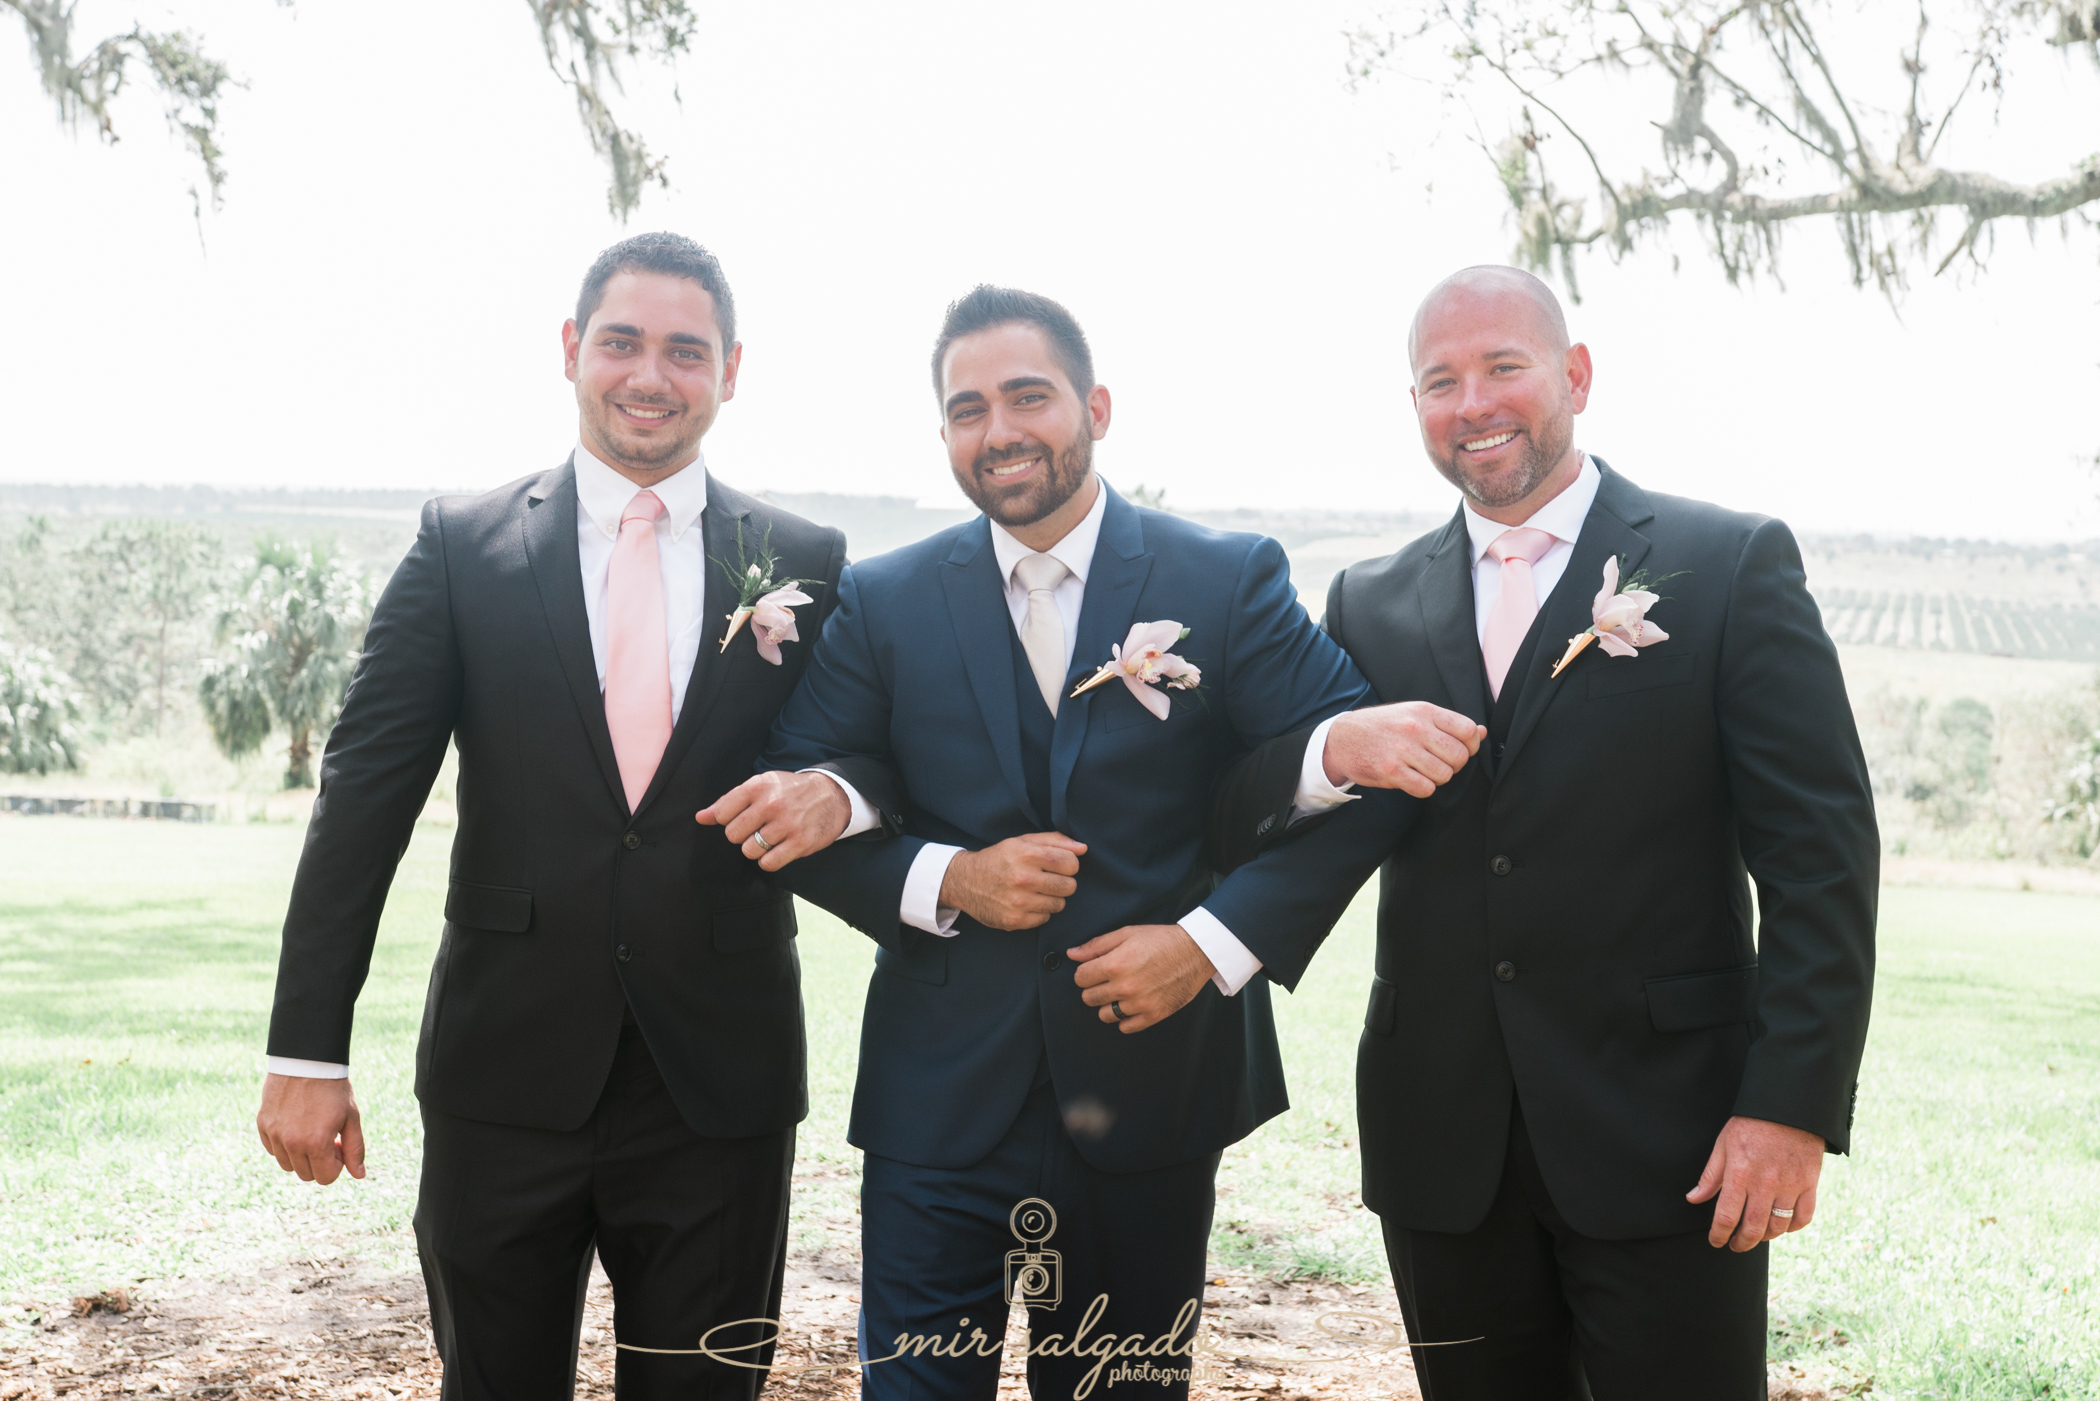 groom-and-groomsmen-photo, Bok-tower-gardens-wedding-photo